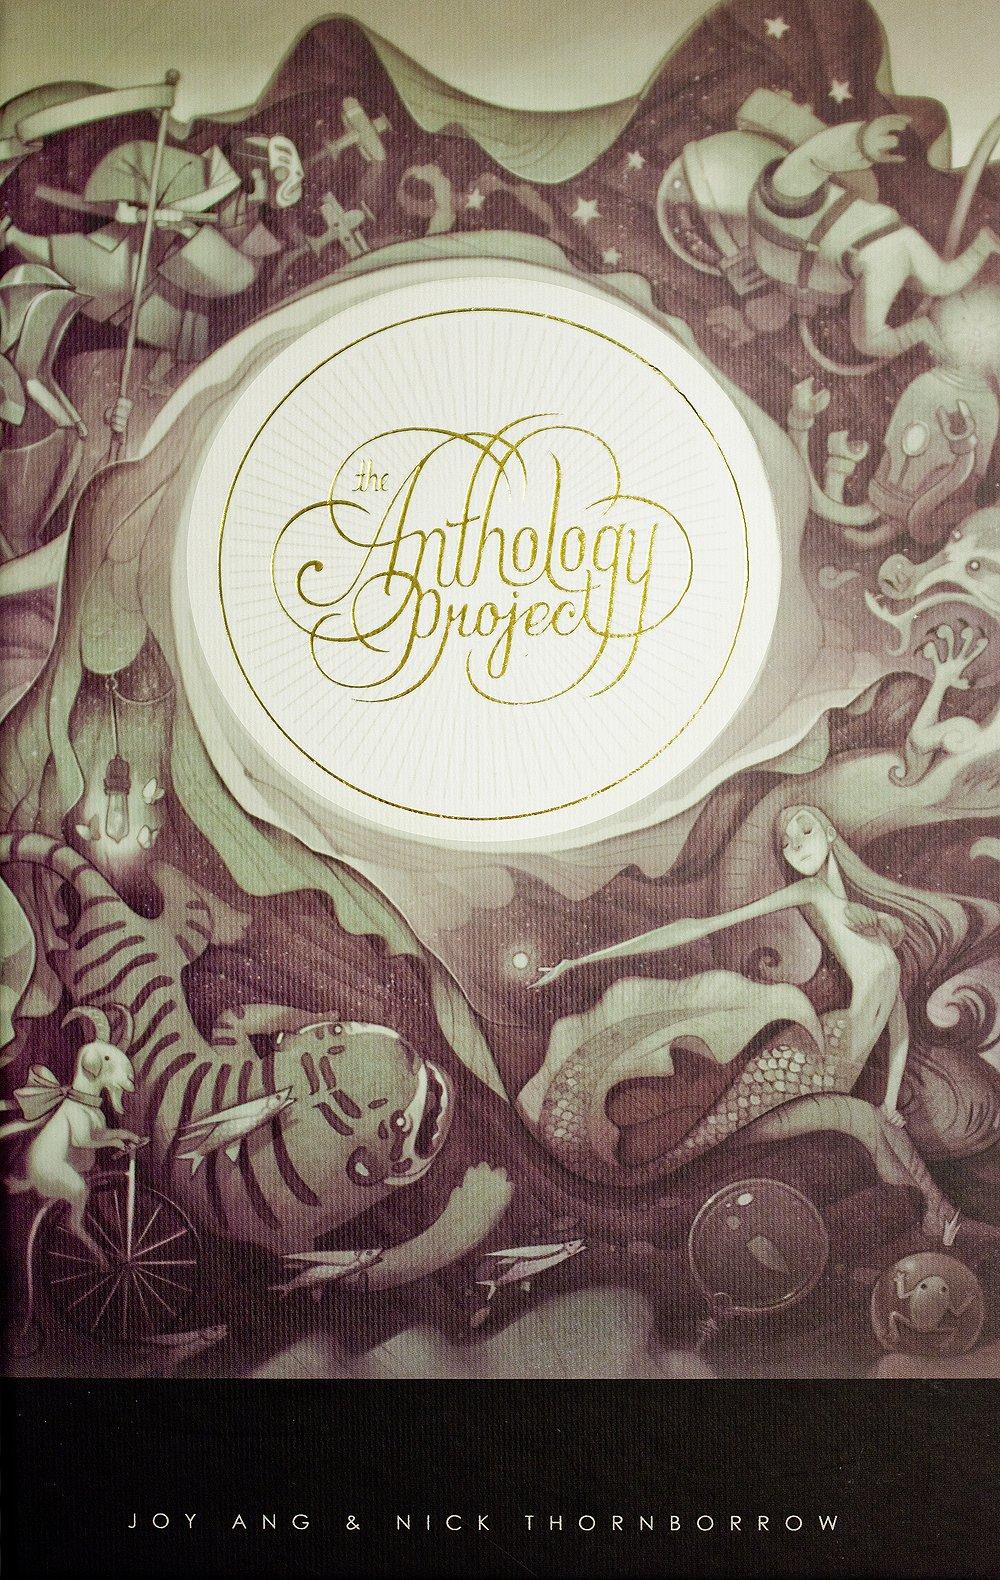 Anthology Project 2 The Anthology Project Volume